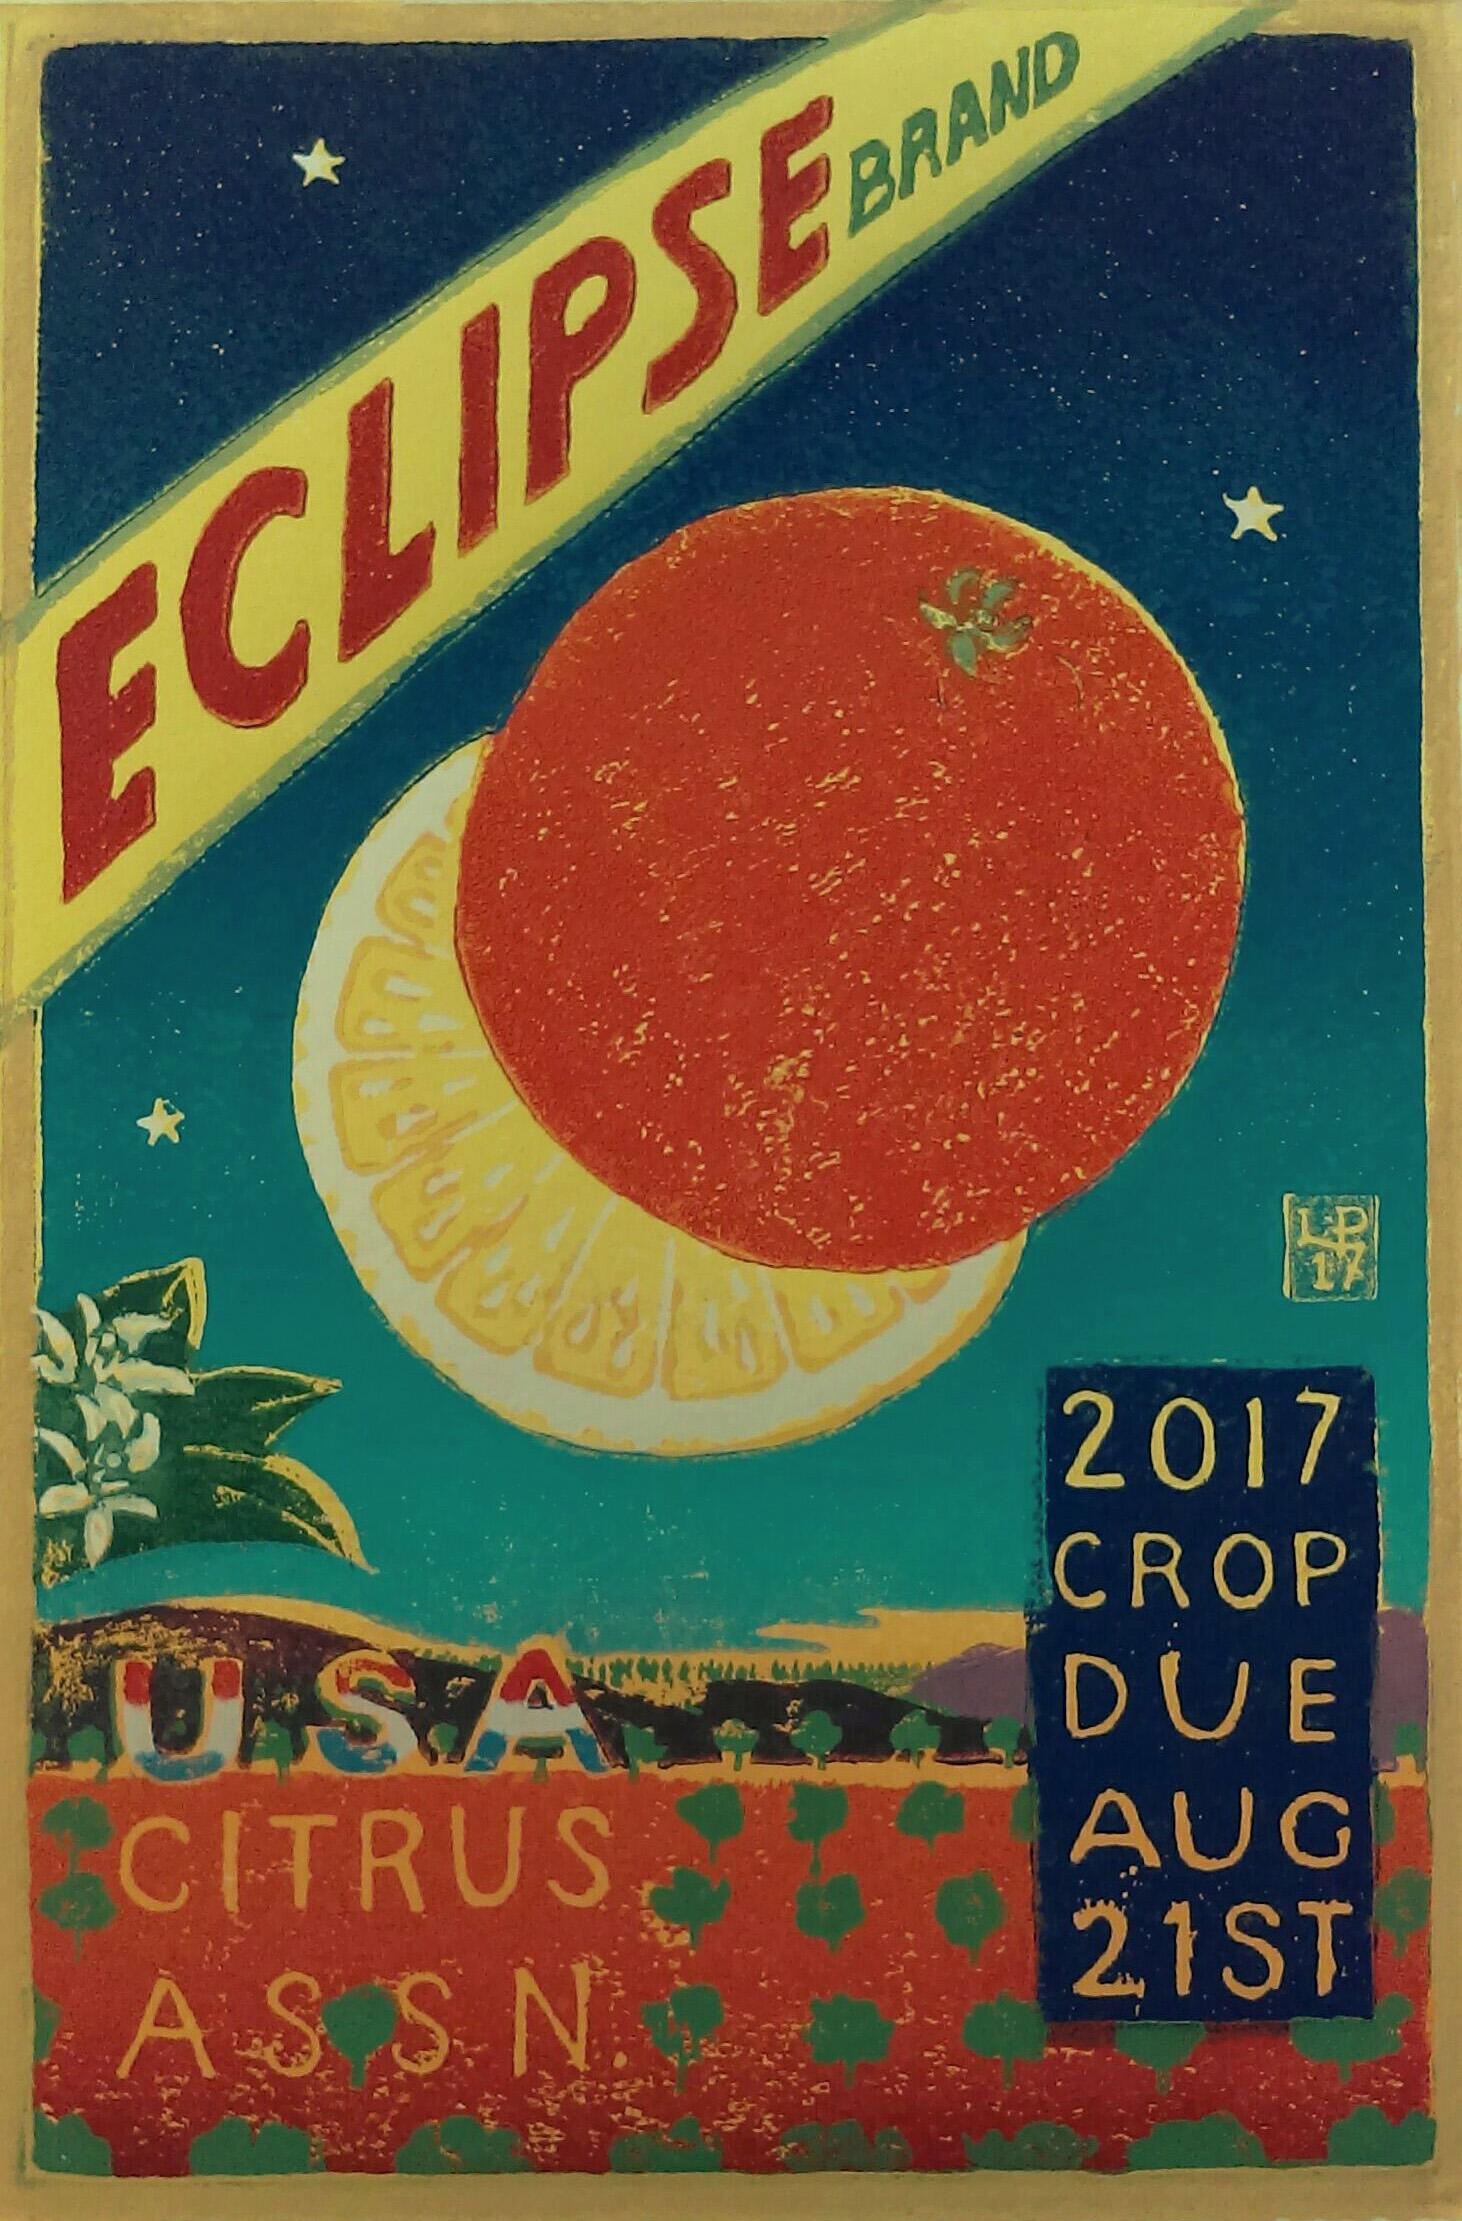 Eclipse Brand Citrus